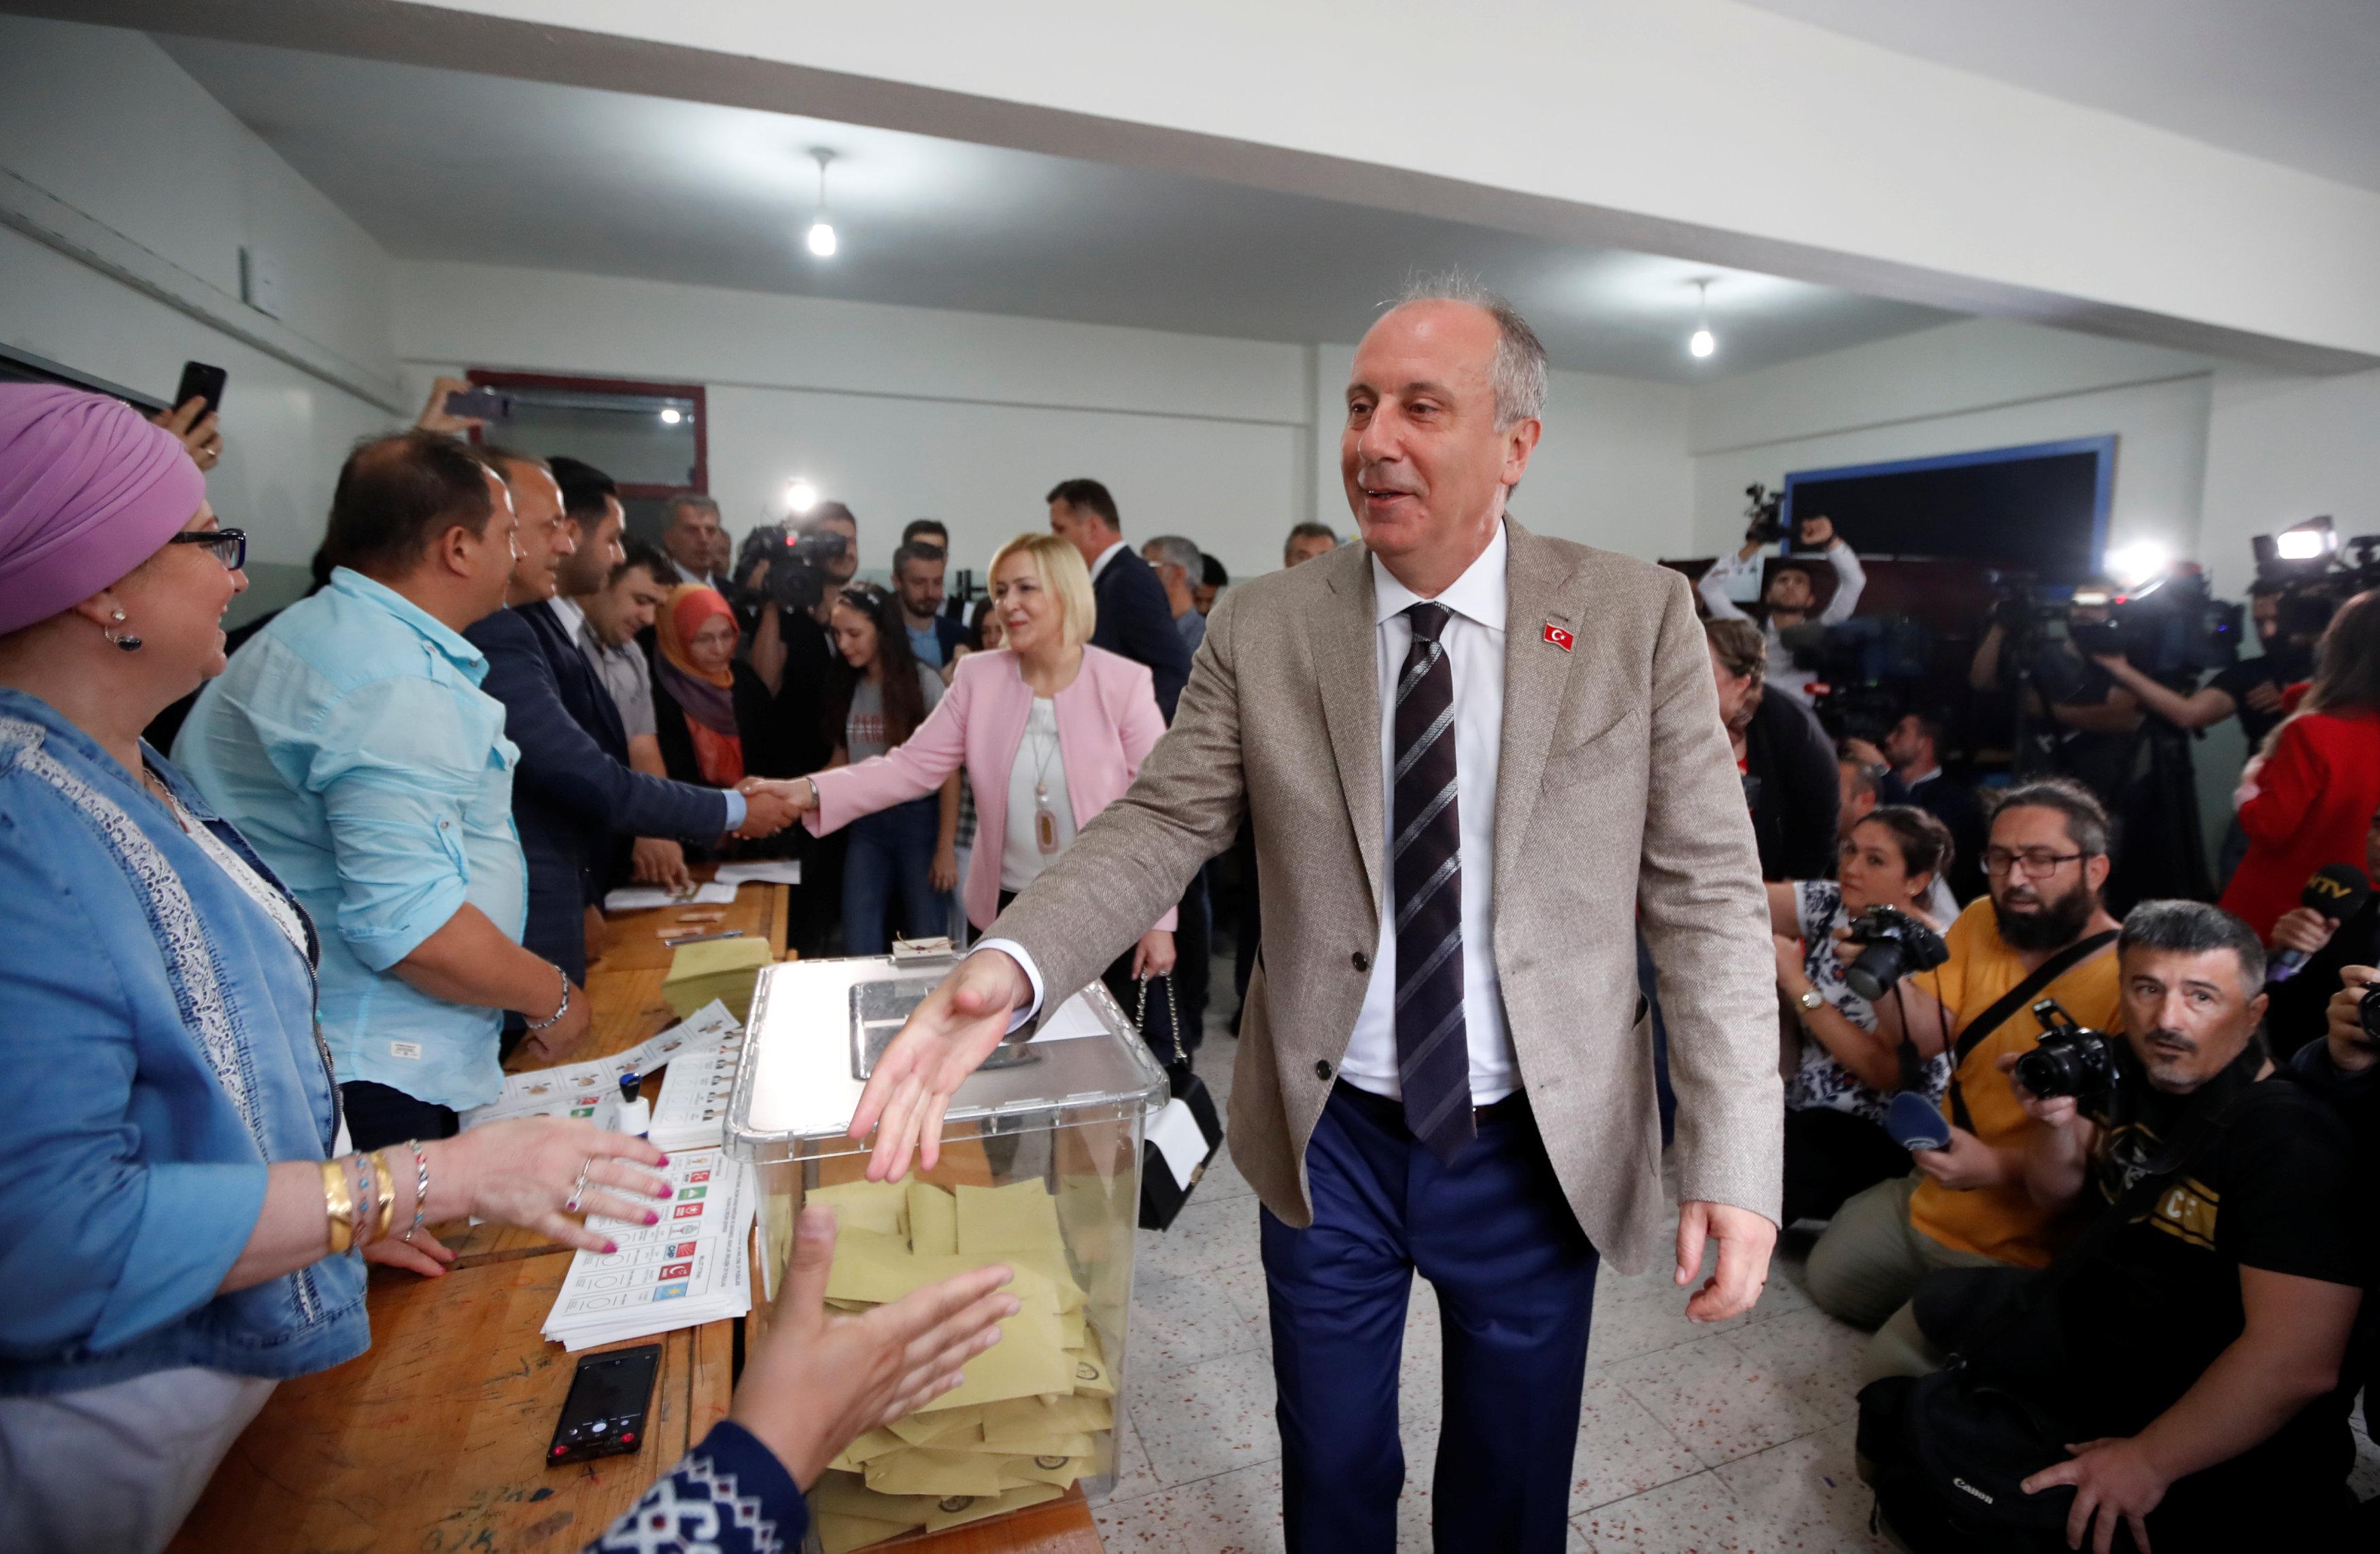 2018-06-24T074427Z_1825475853_RC182FCB15F0_RTRMADP_3_TURKEY-ELECTION